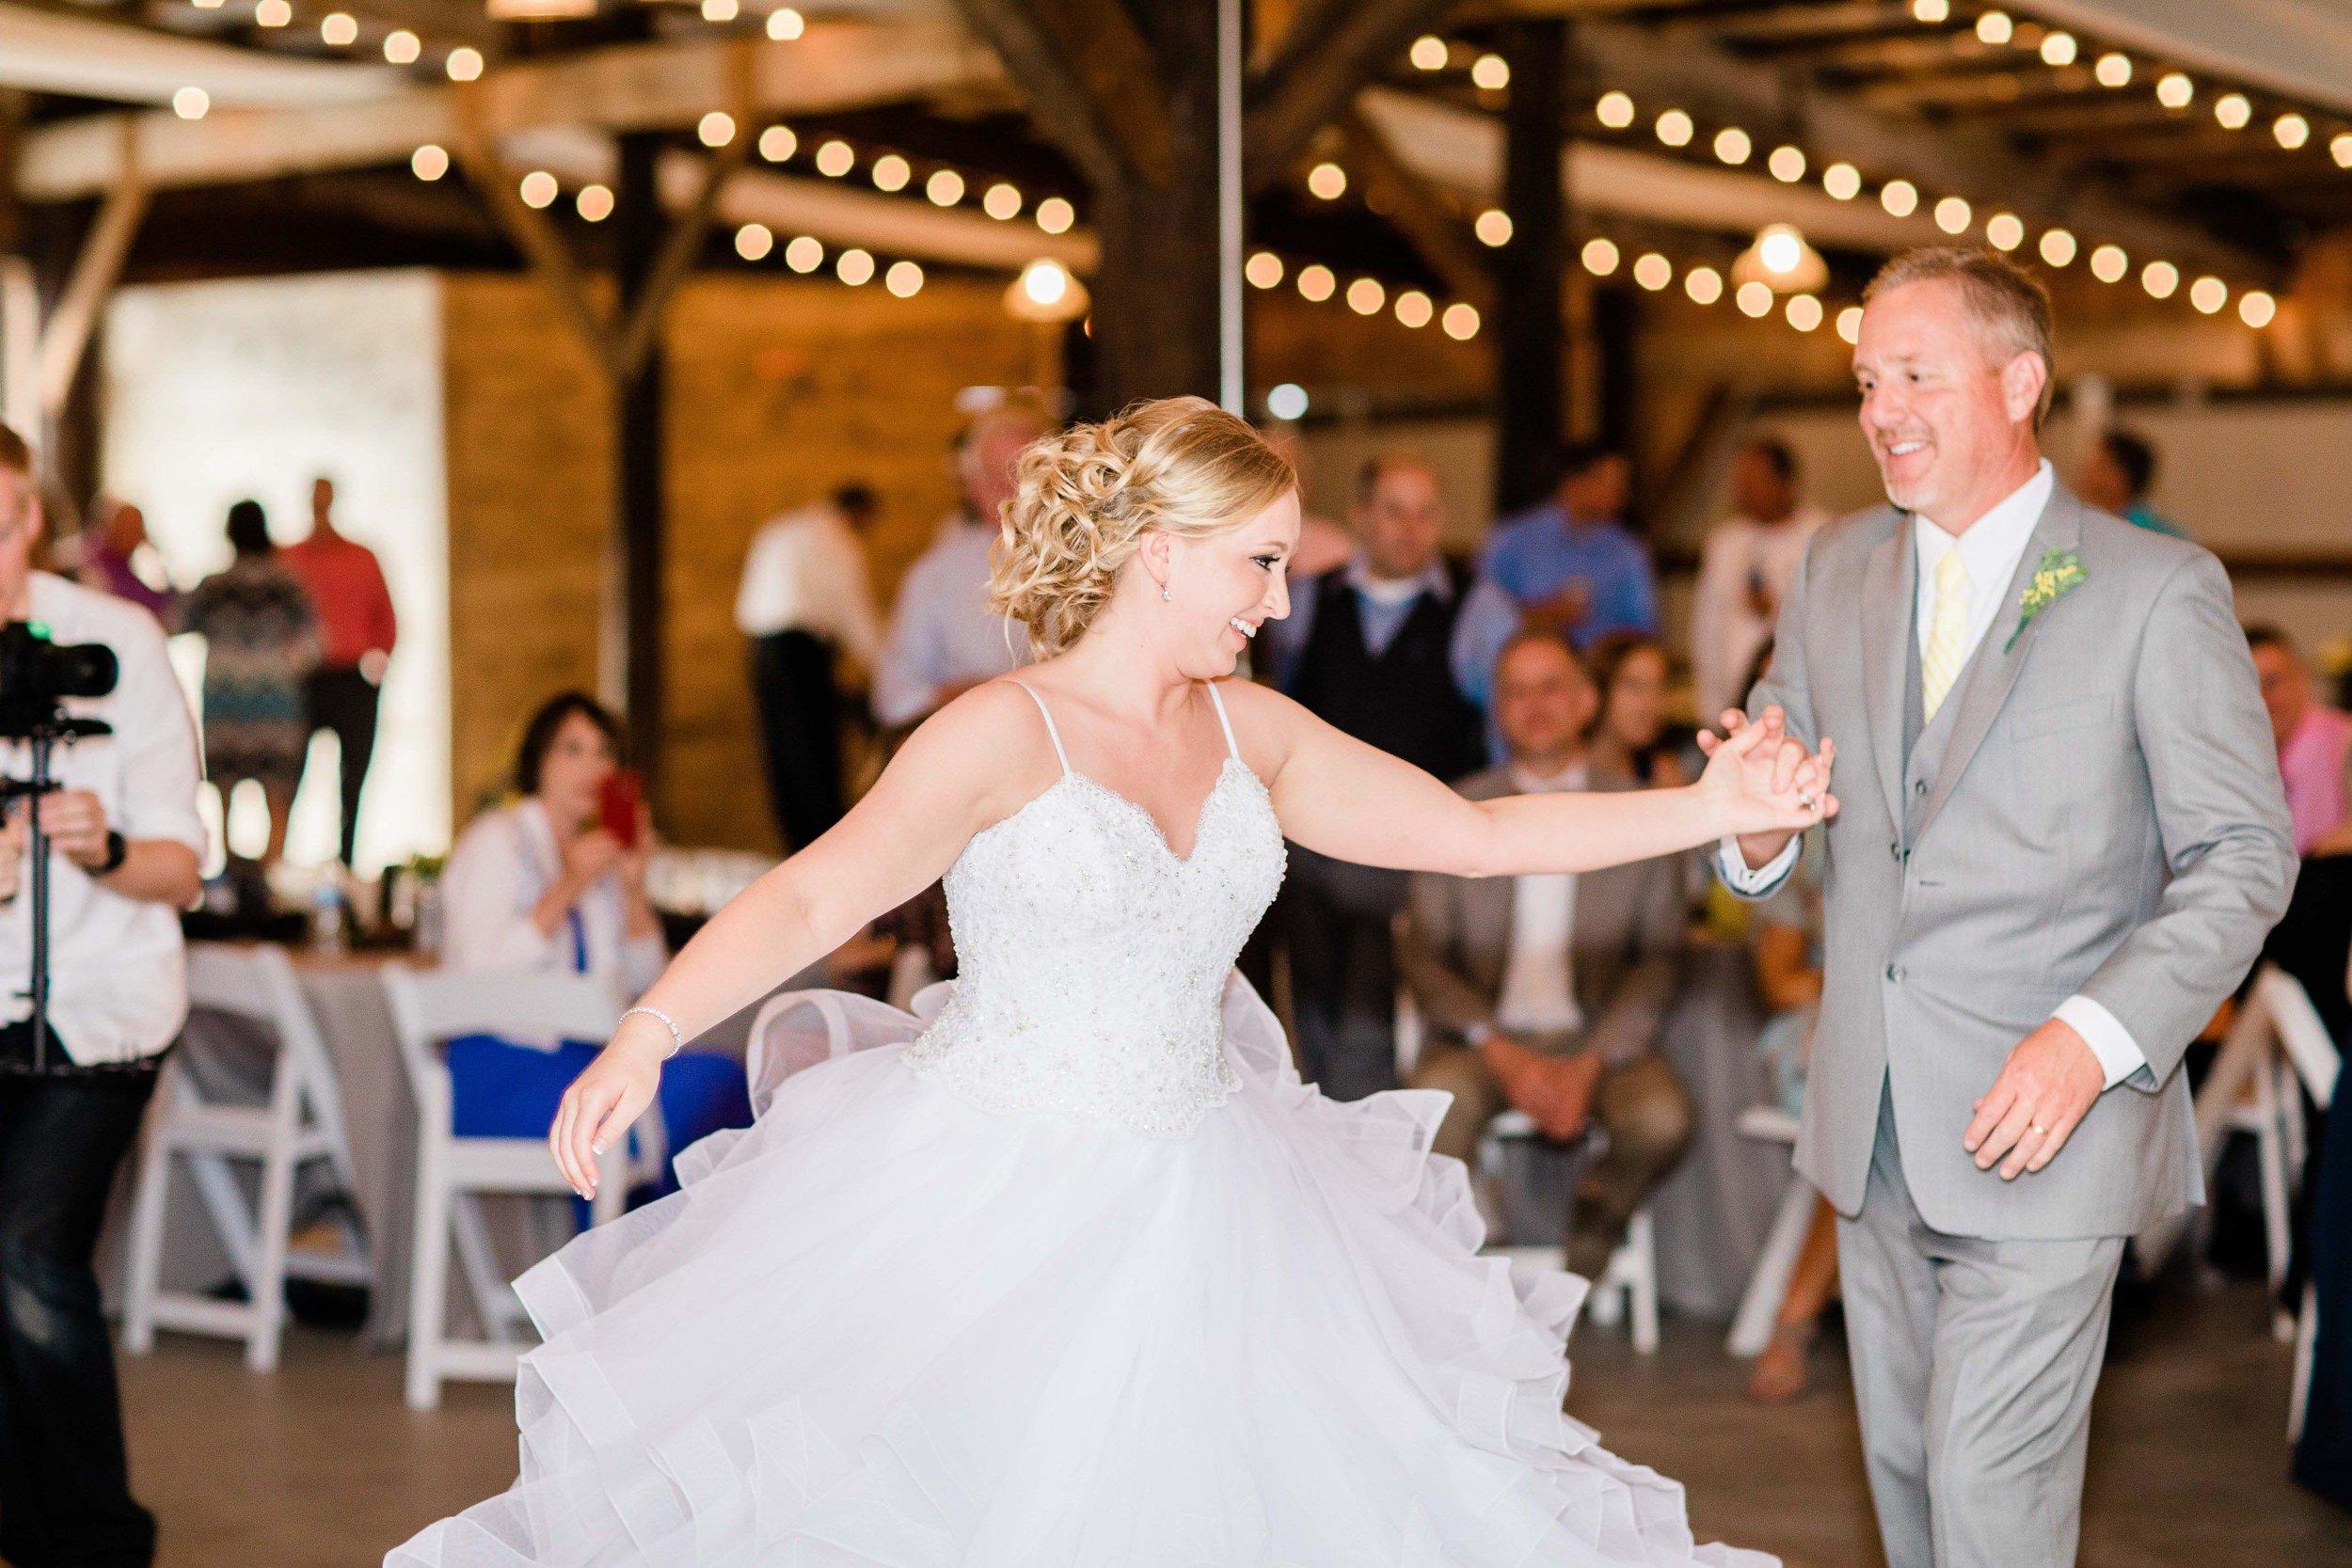 r buckeye barn southwest ohio wedding photographer-7.jpg